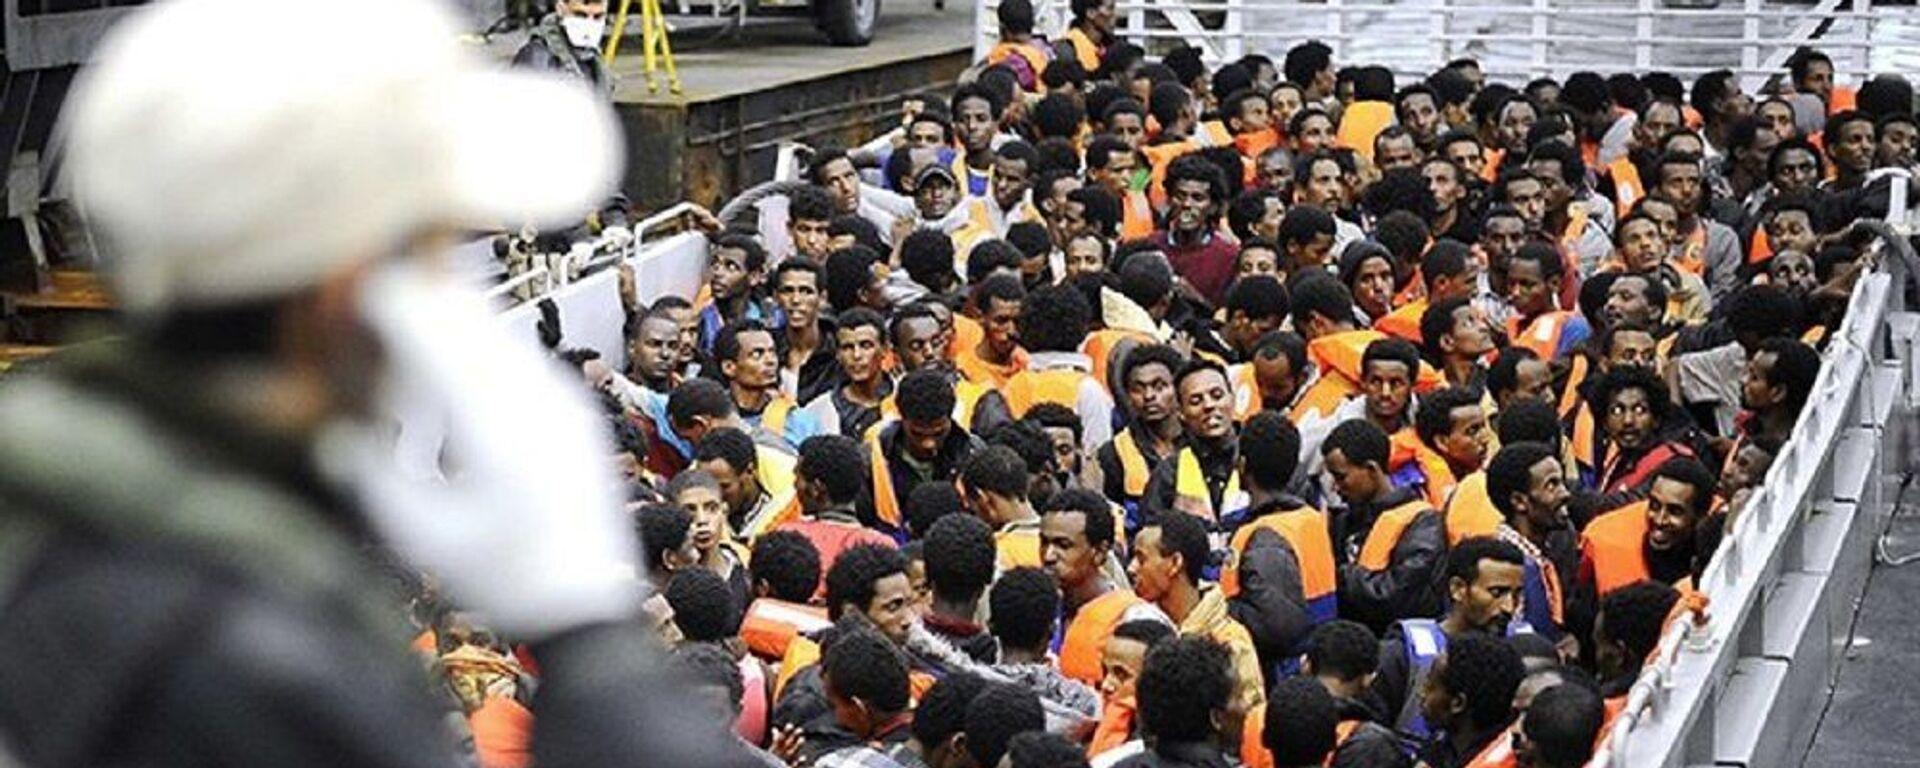 Le drame de l'immigration clandestine en France et en Europe - Sputnik France, 1920, 21.07.2021